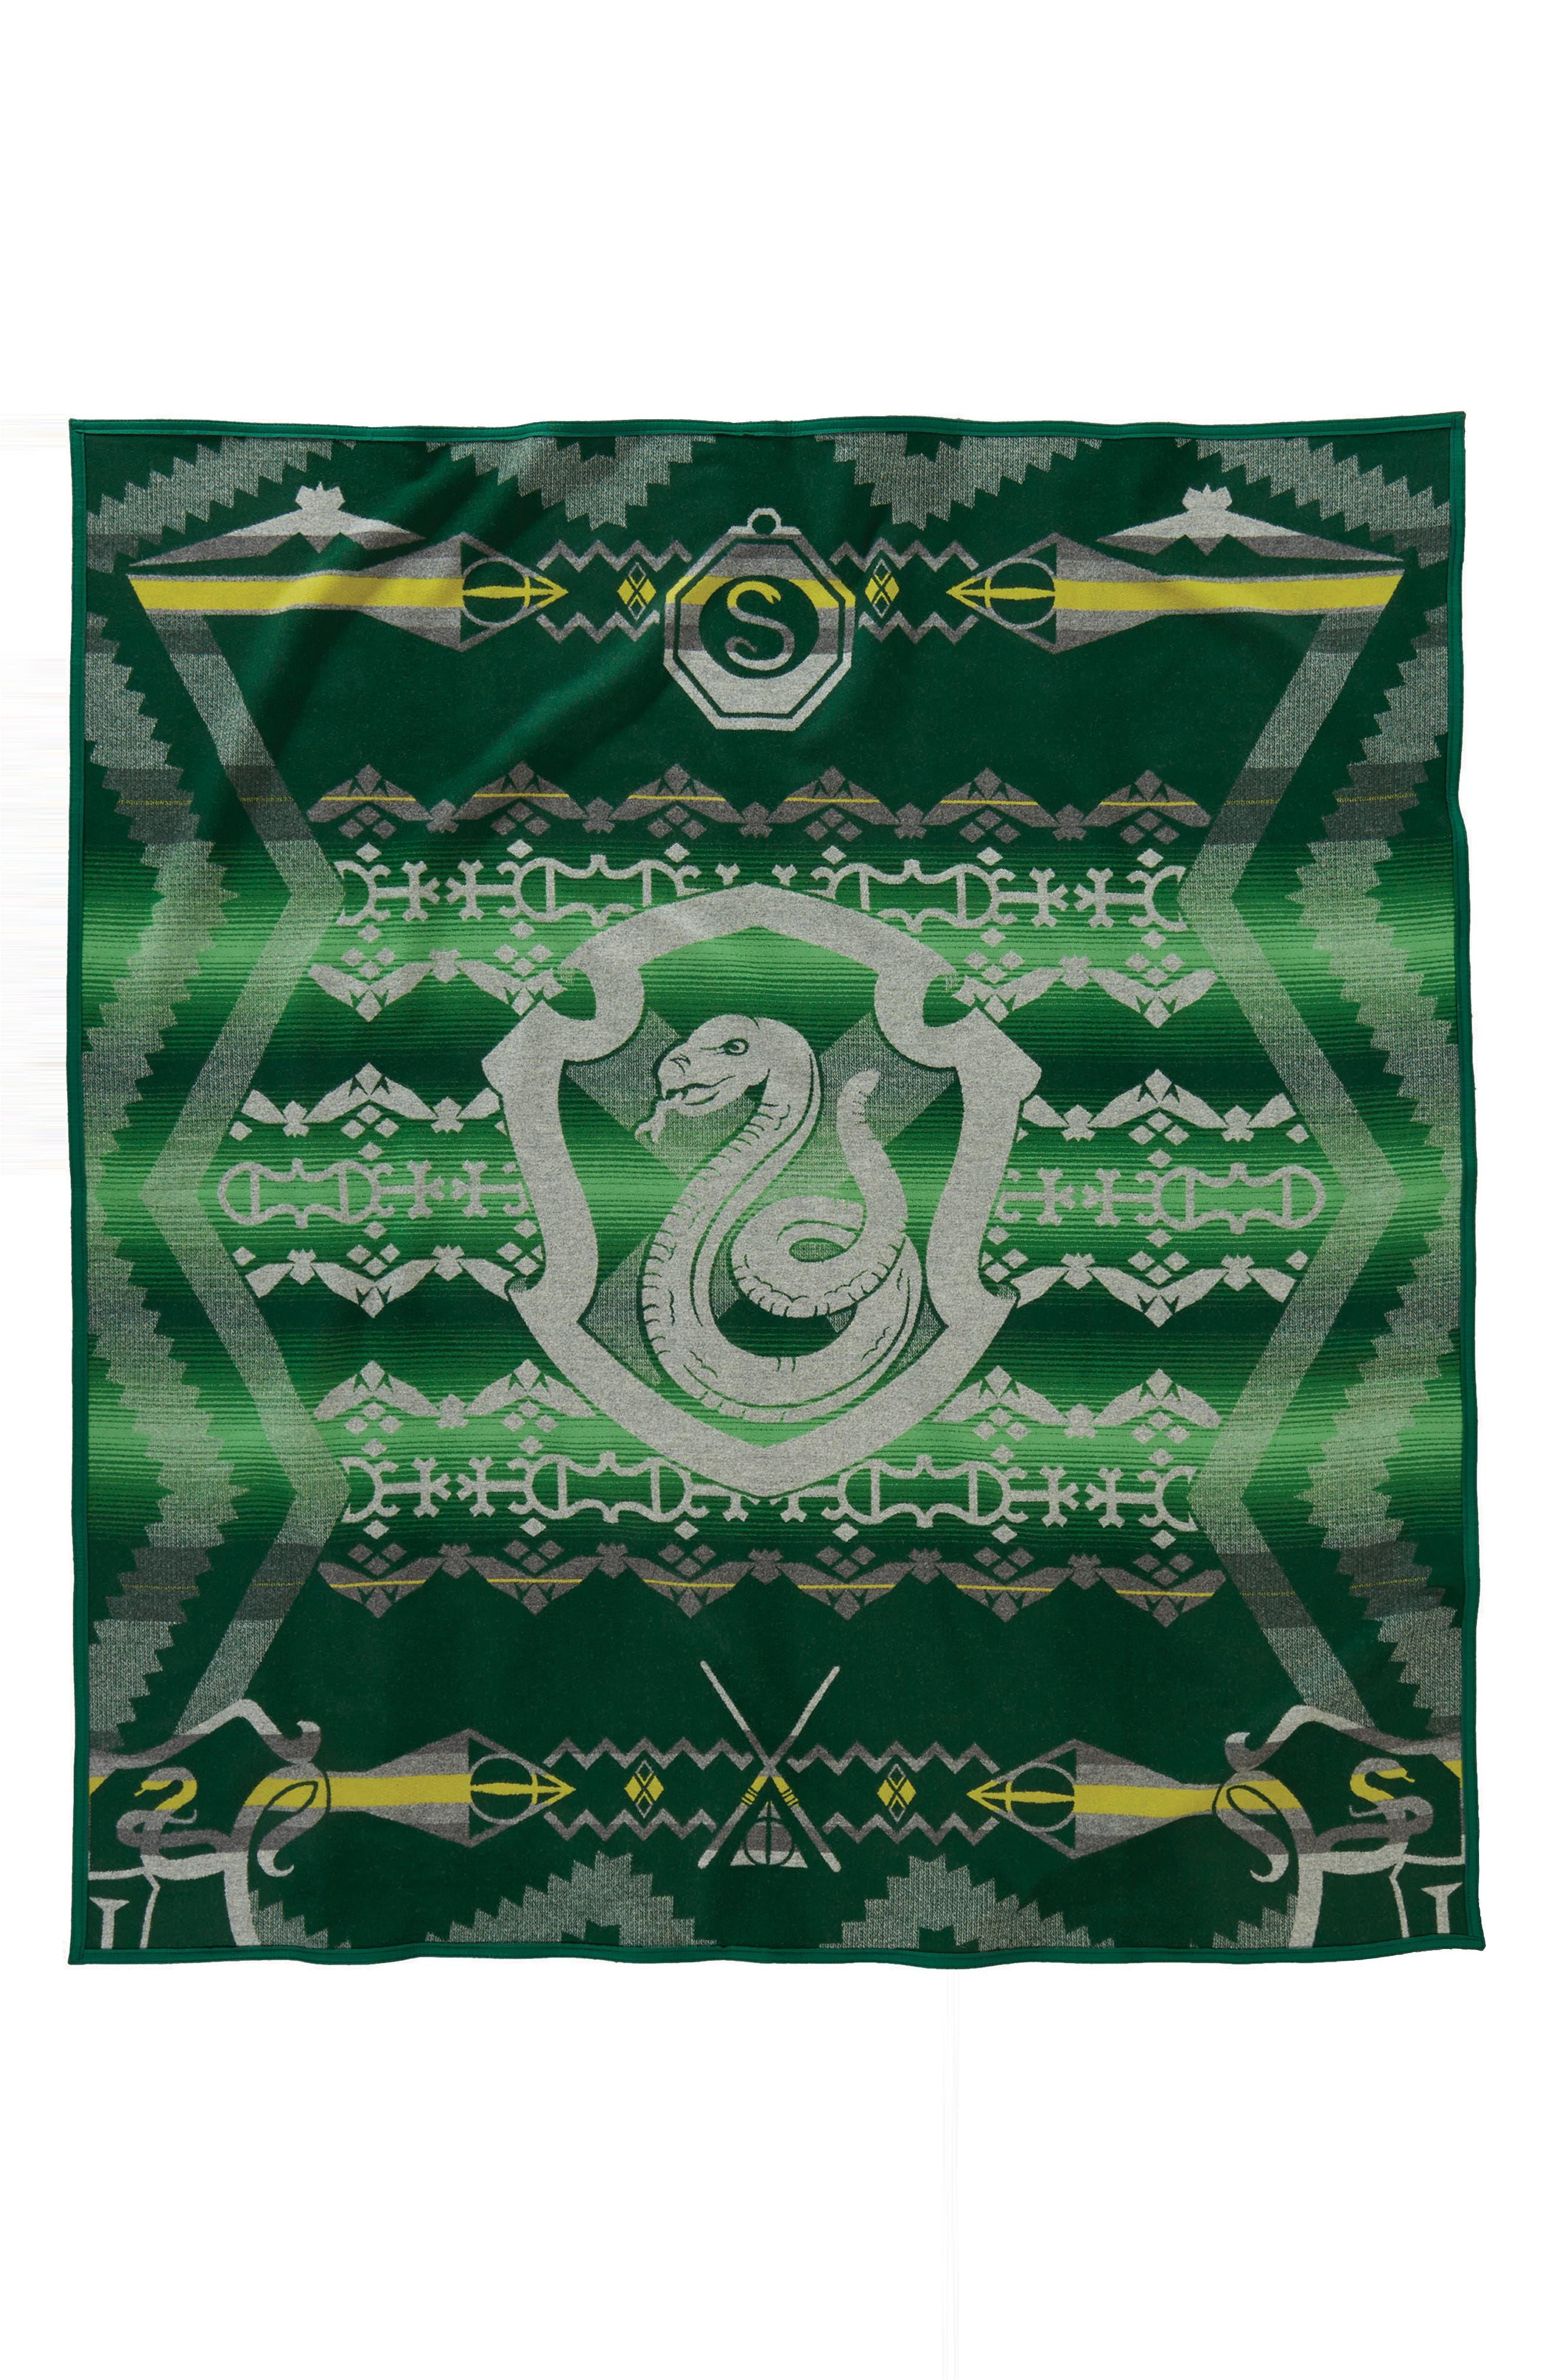 Harry Potter - Slytherin Blanket,                         Main,                         color, Green